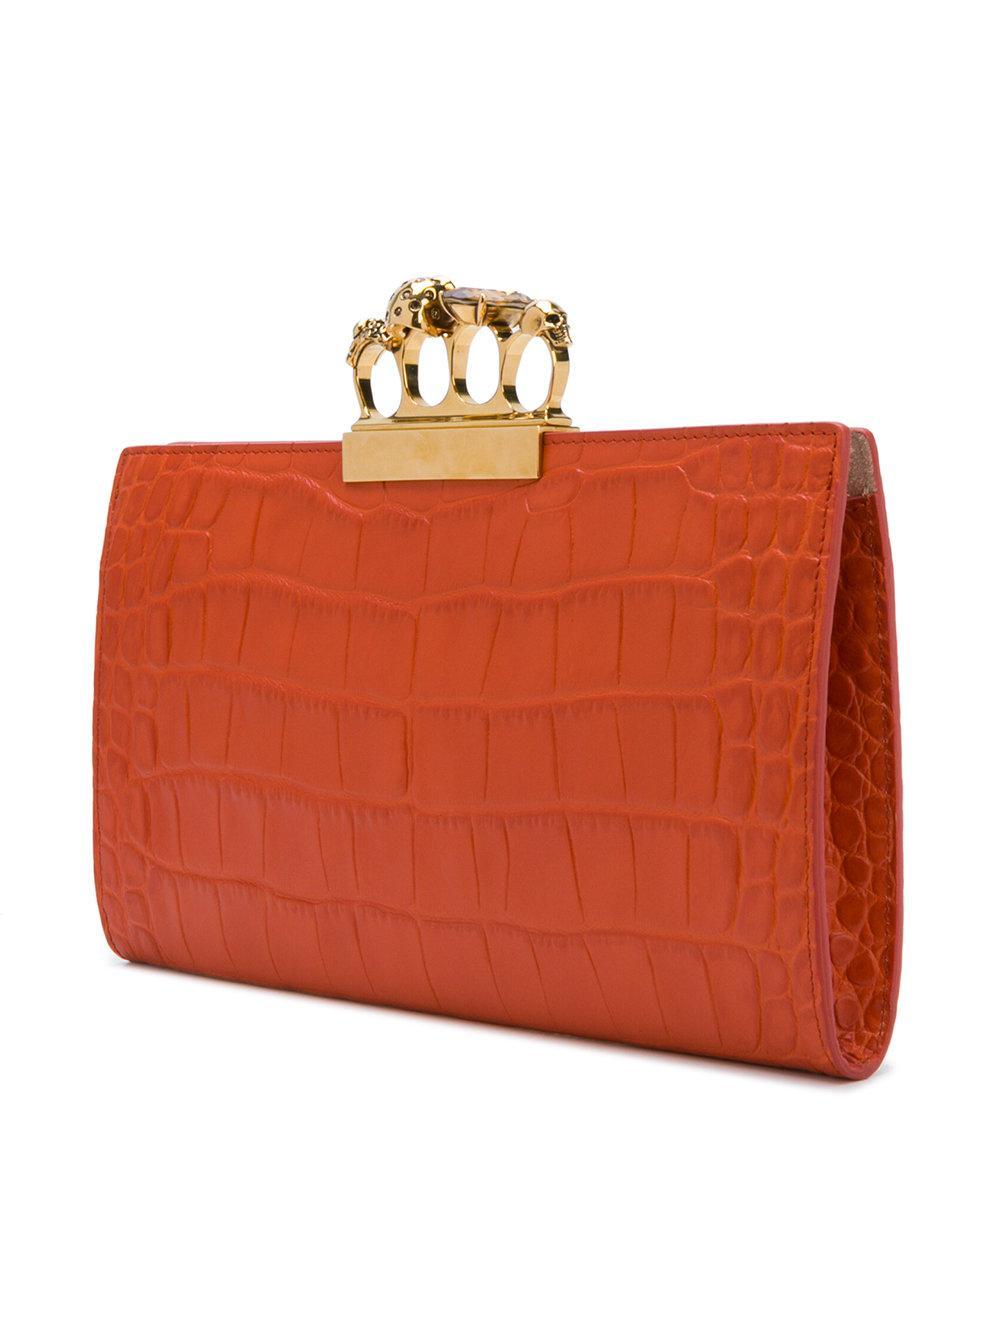 Choice Cheap Online Knuckle Duster clutch bag - Yellow & Orange Alexander McQueen Cheap 2018 Pictures wx2QJjXr